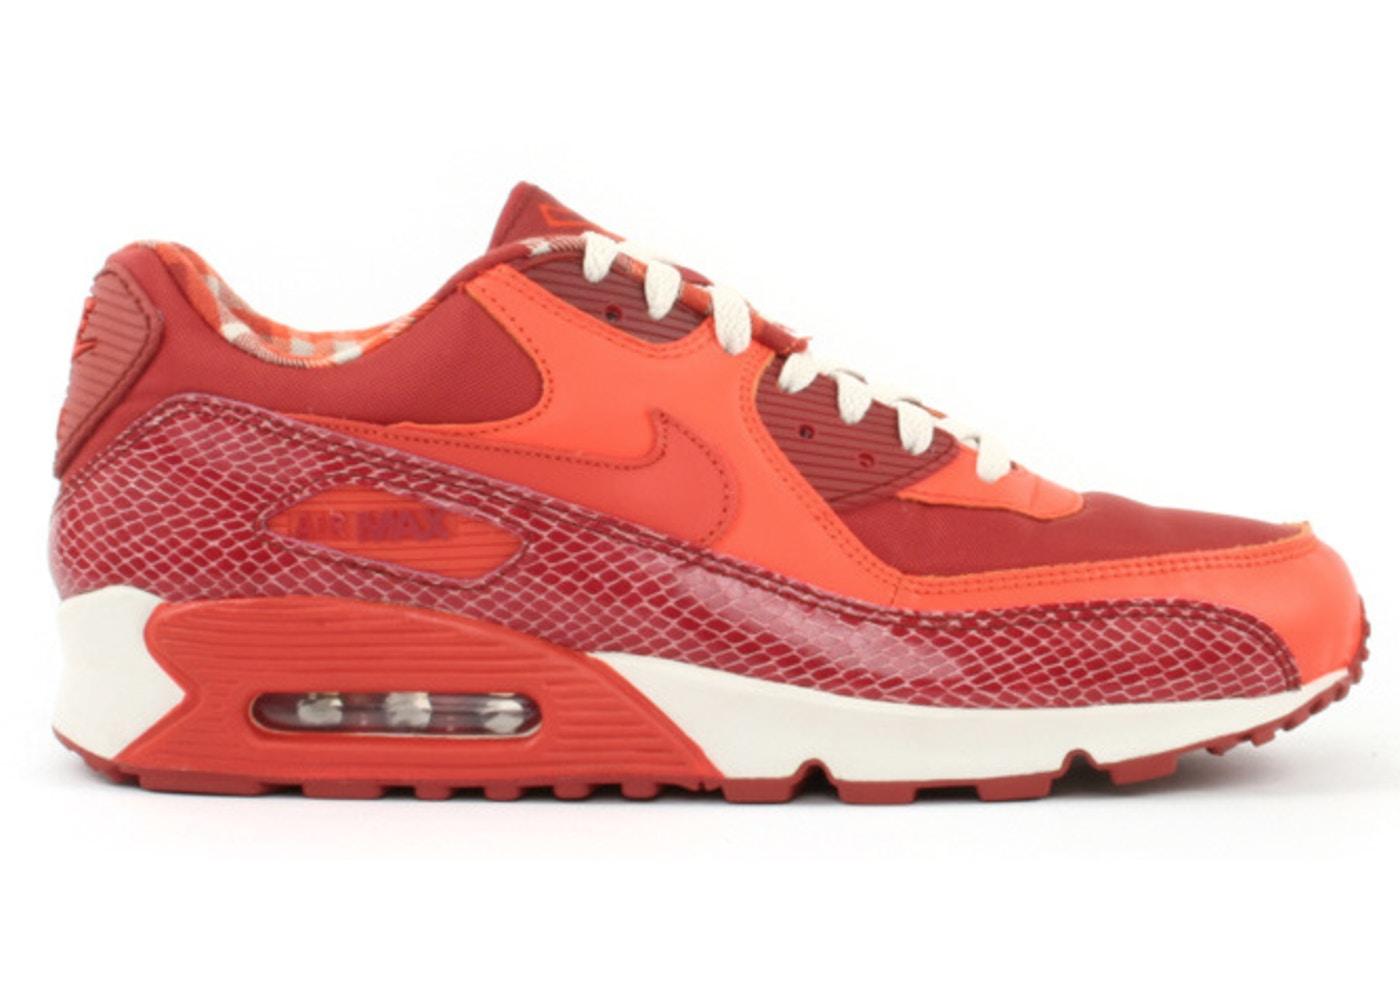 separation shoes 11784 b847e Air Max 90 Steve Nash - 314864-881